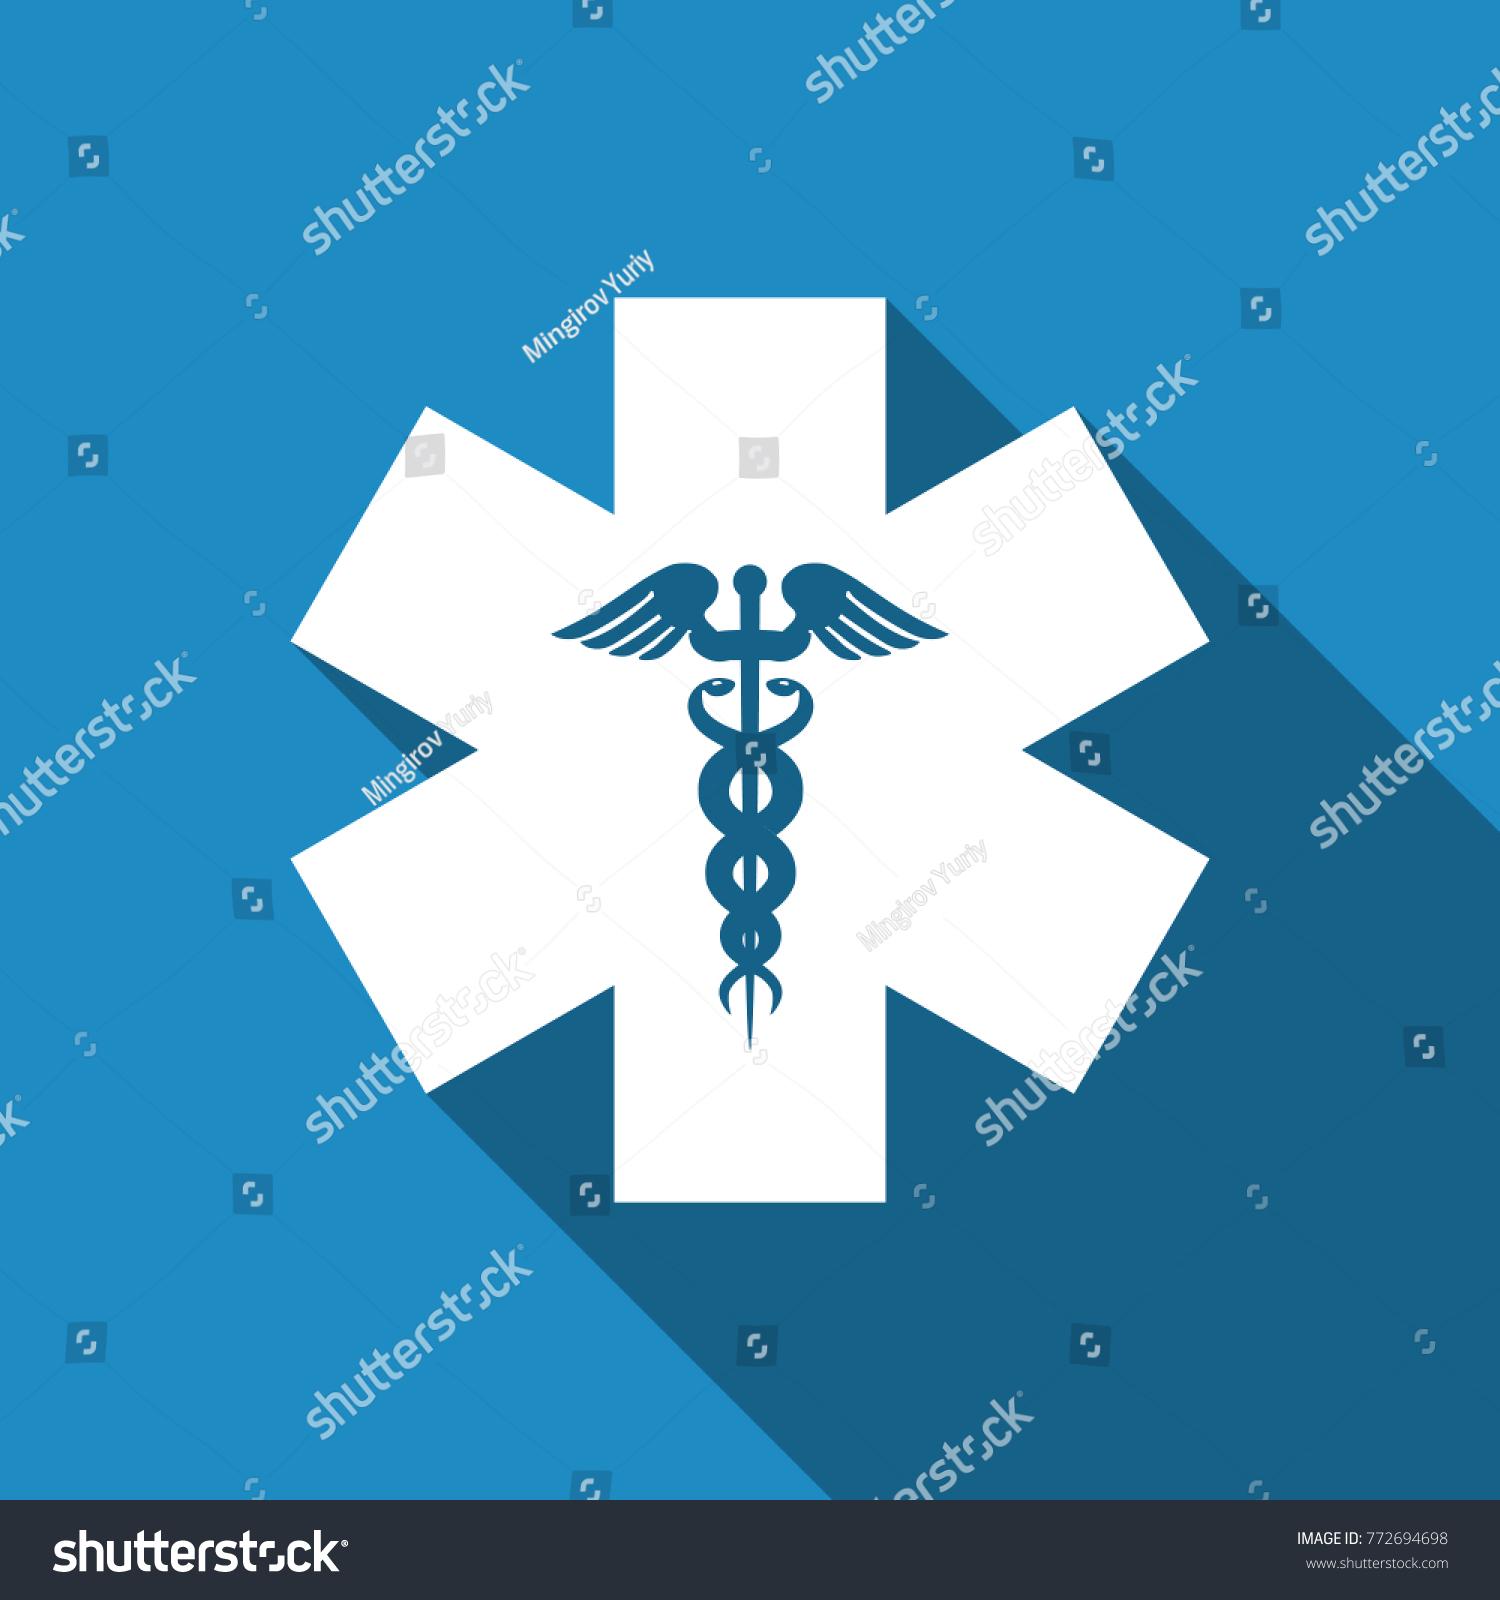 Emergency Star Medical Symbol Caduceus Snake Stock Vector Royalty